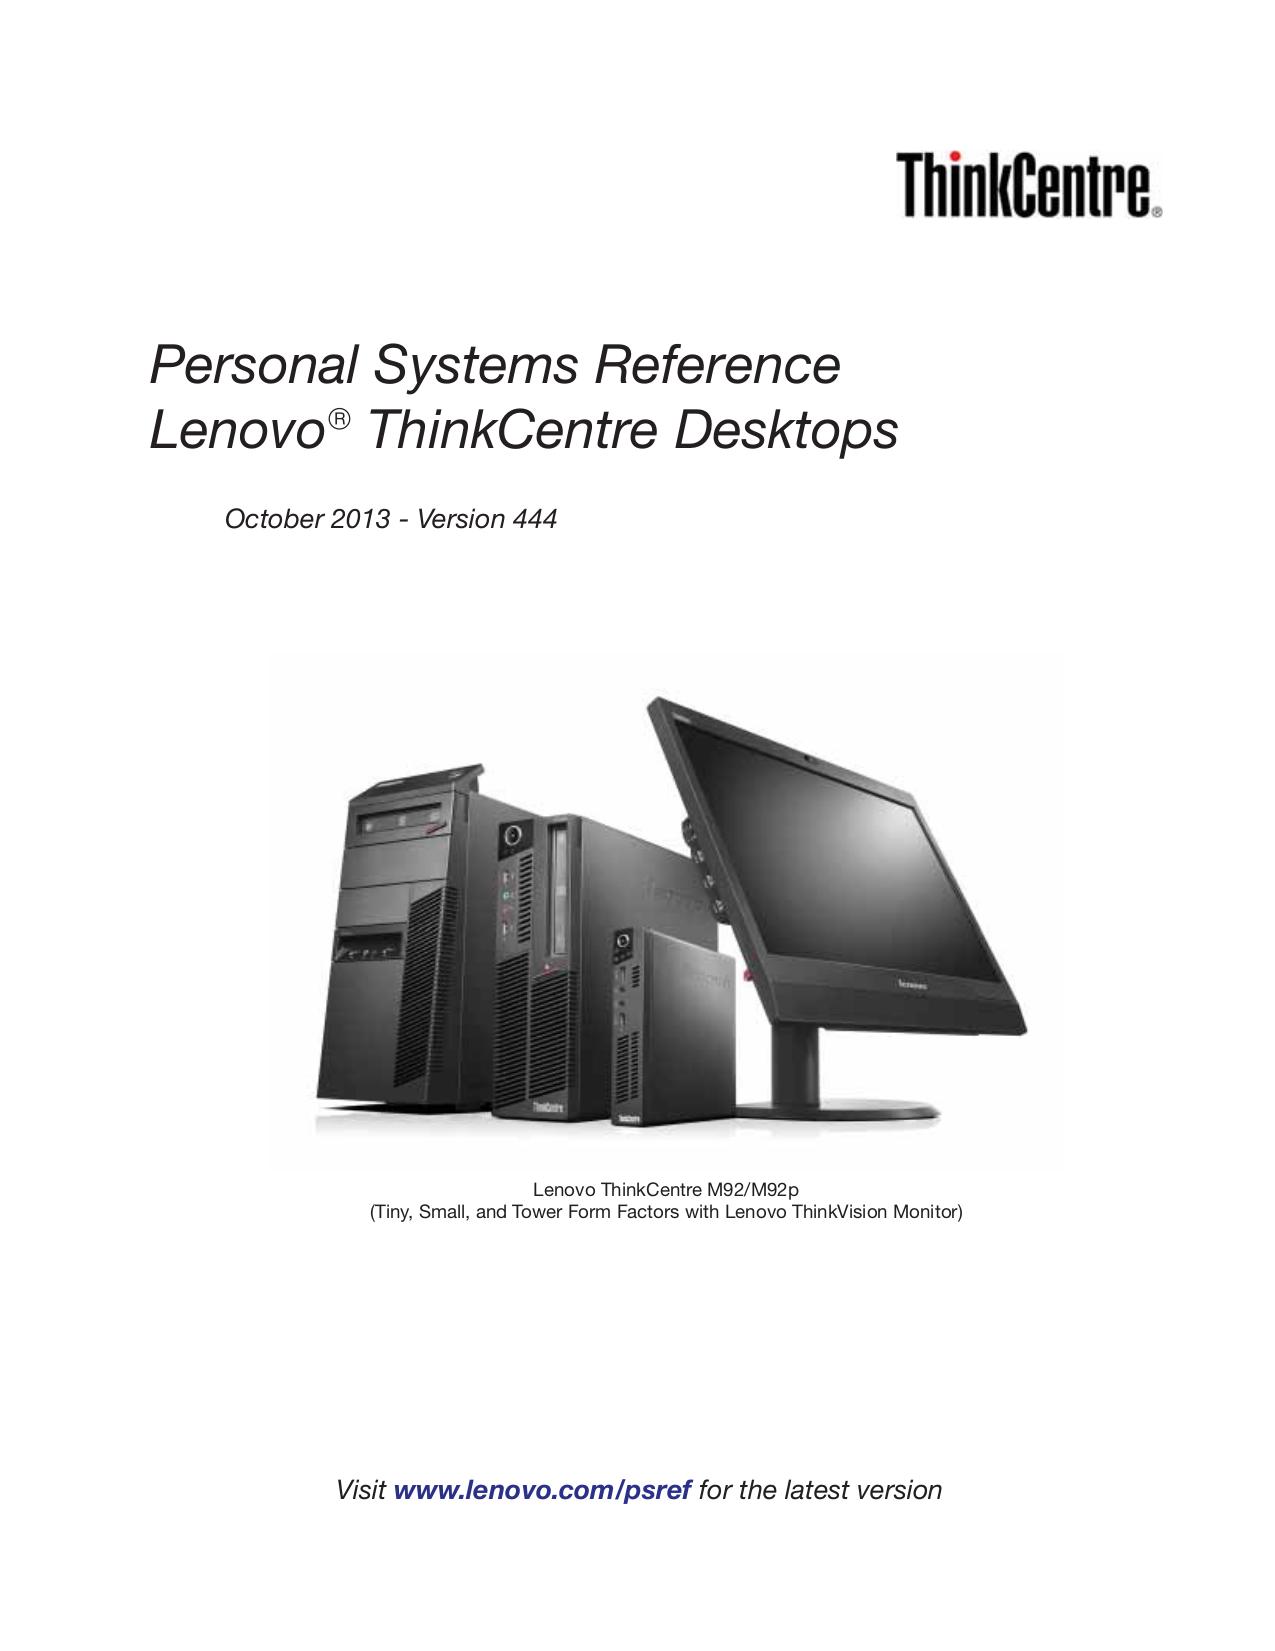 pdf for Lenovo Desktop ThinkCentre M77 1995 manual